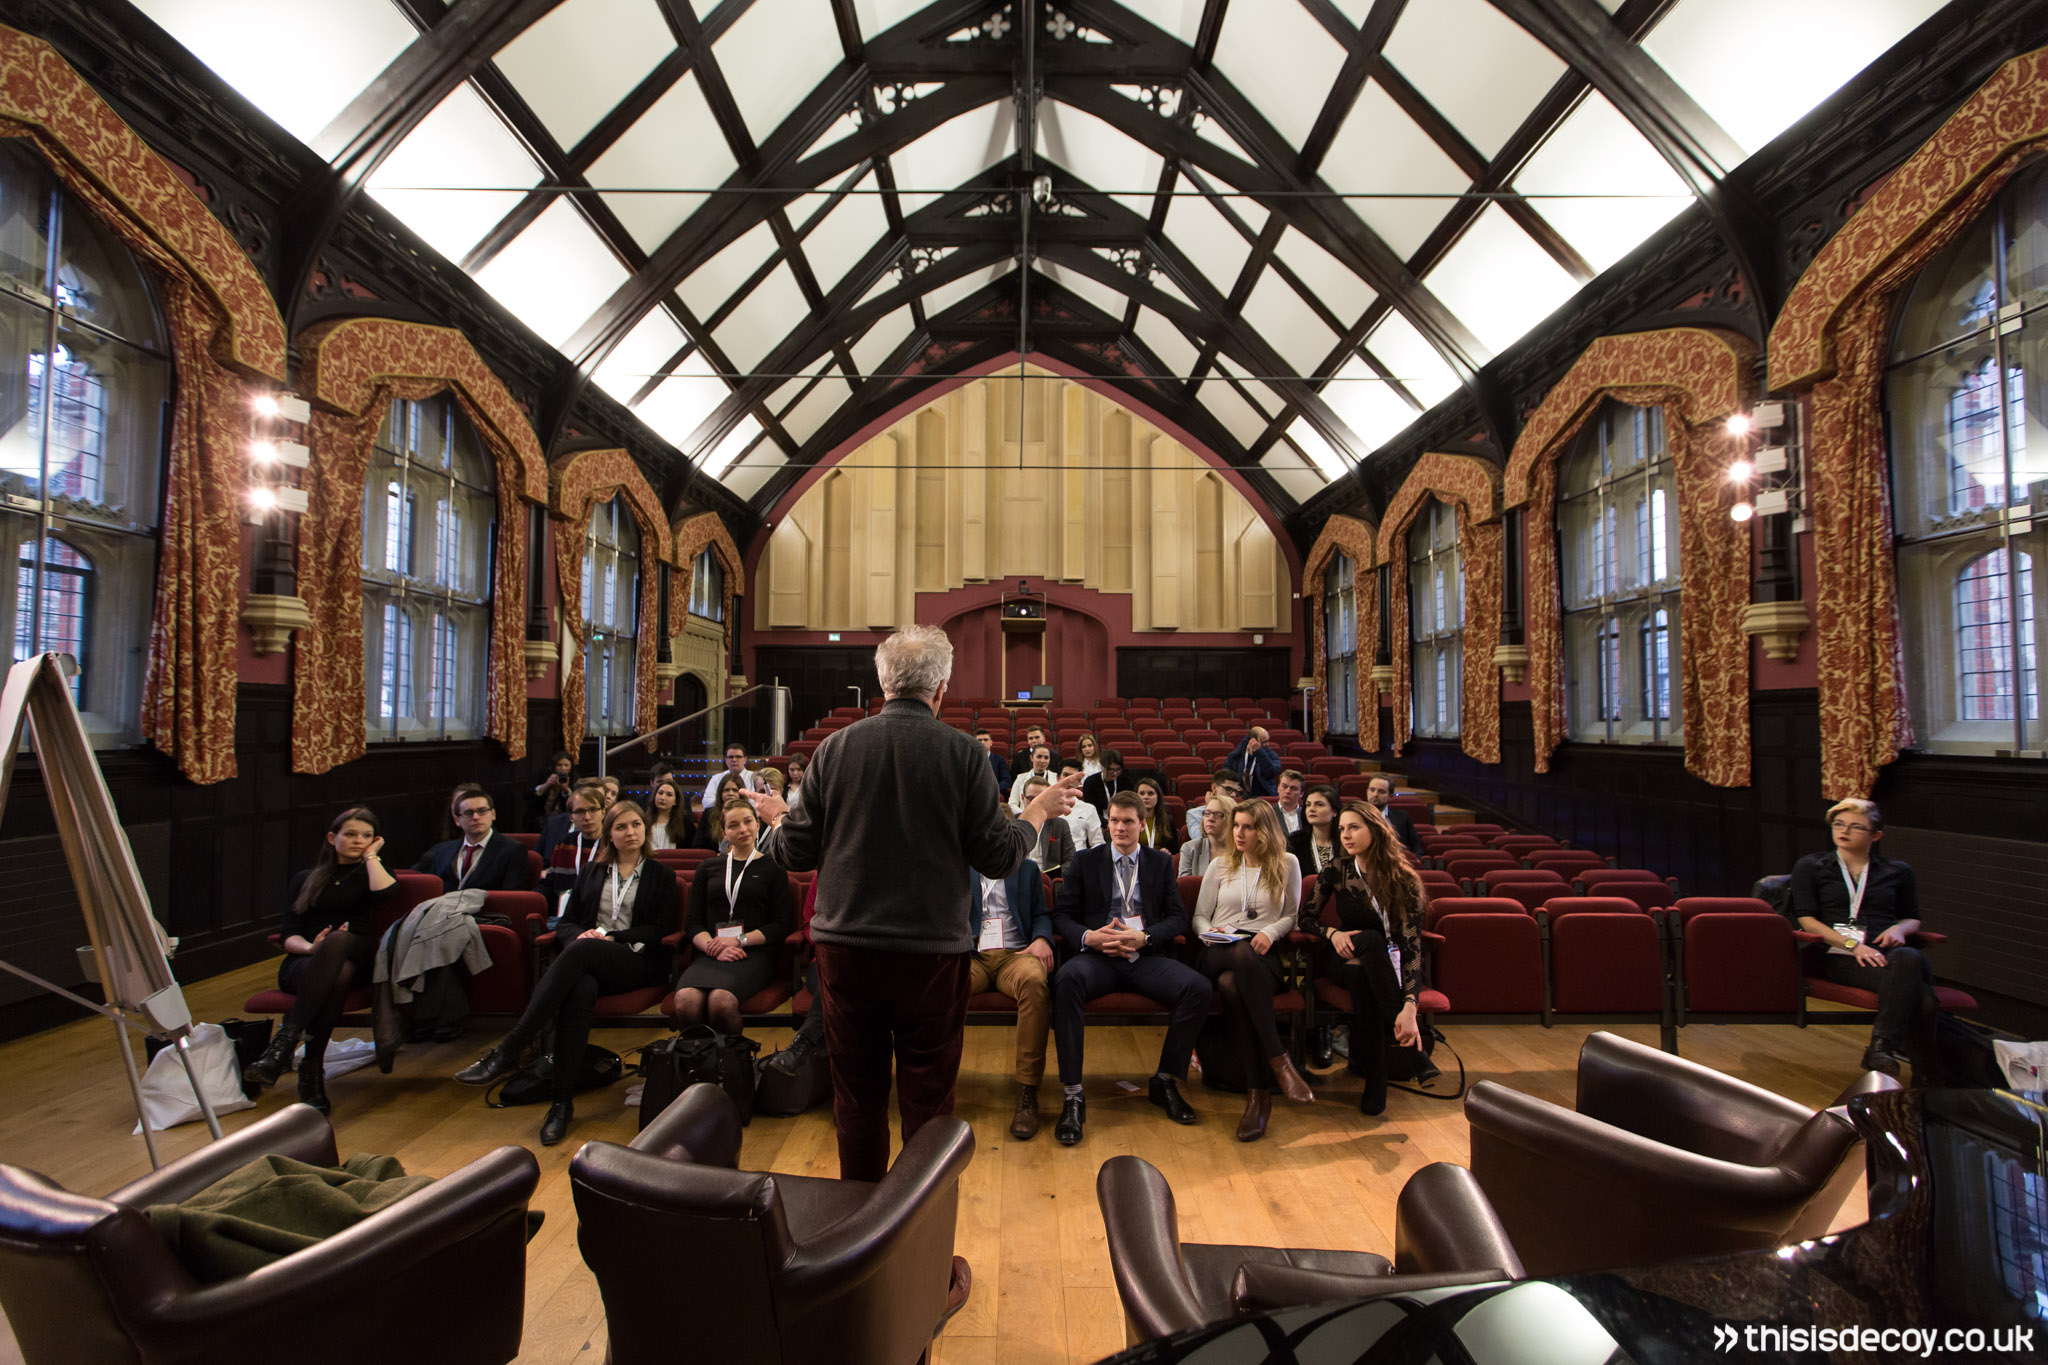 Polish Congress of Student Societies in the UK 2017 - Decoy Media - 4.jpg